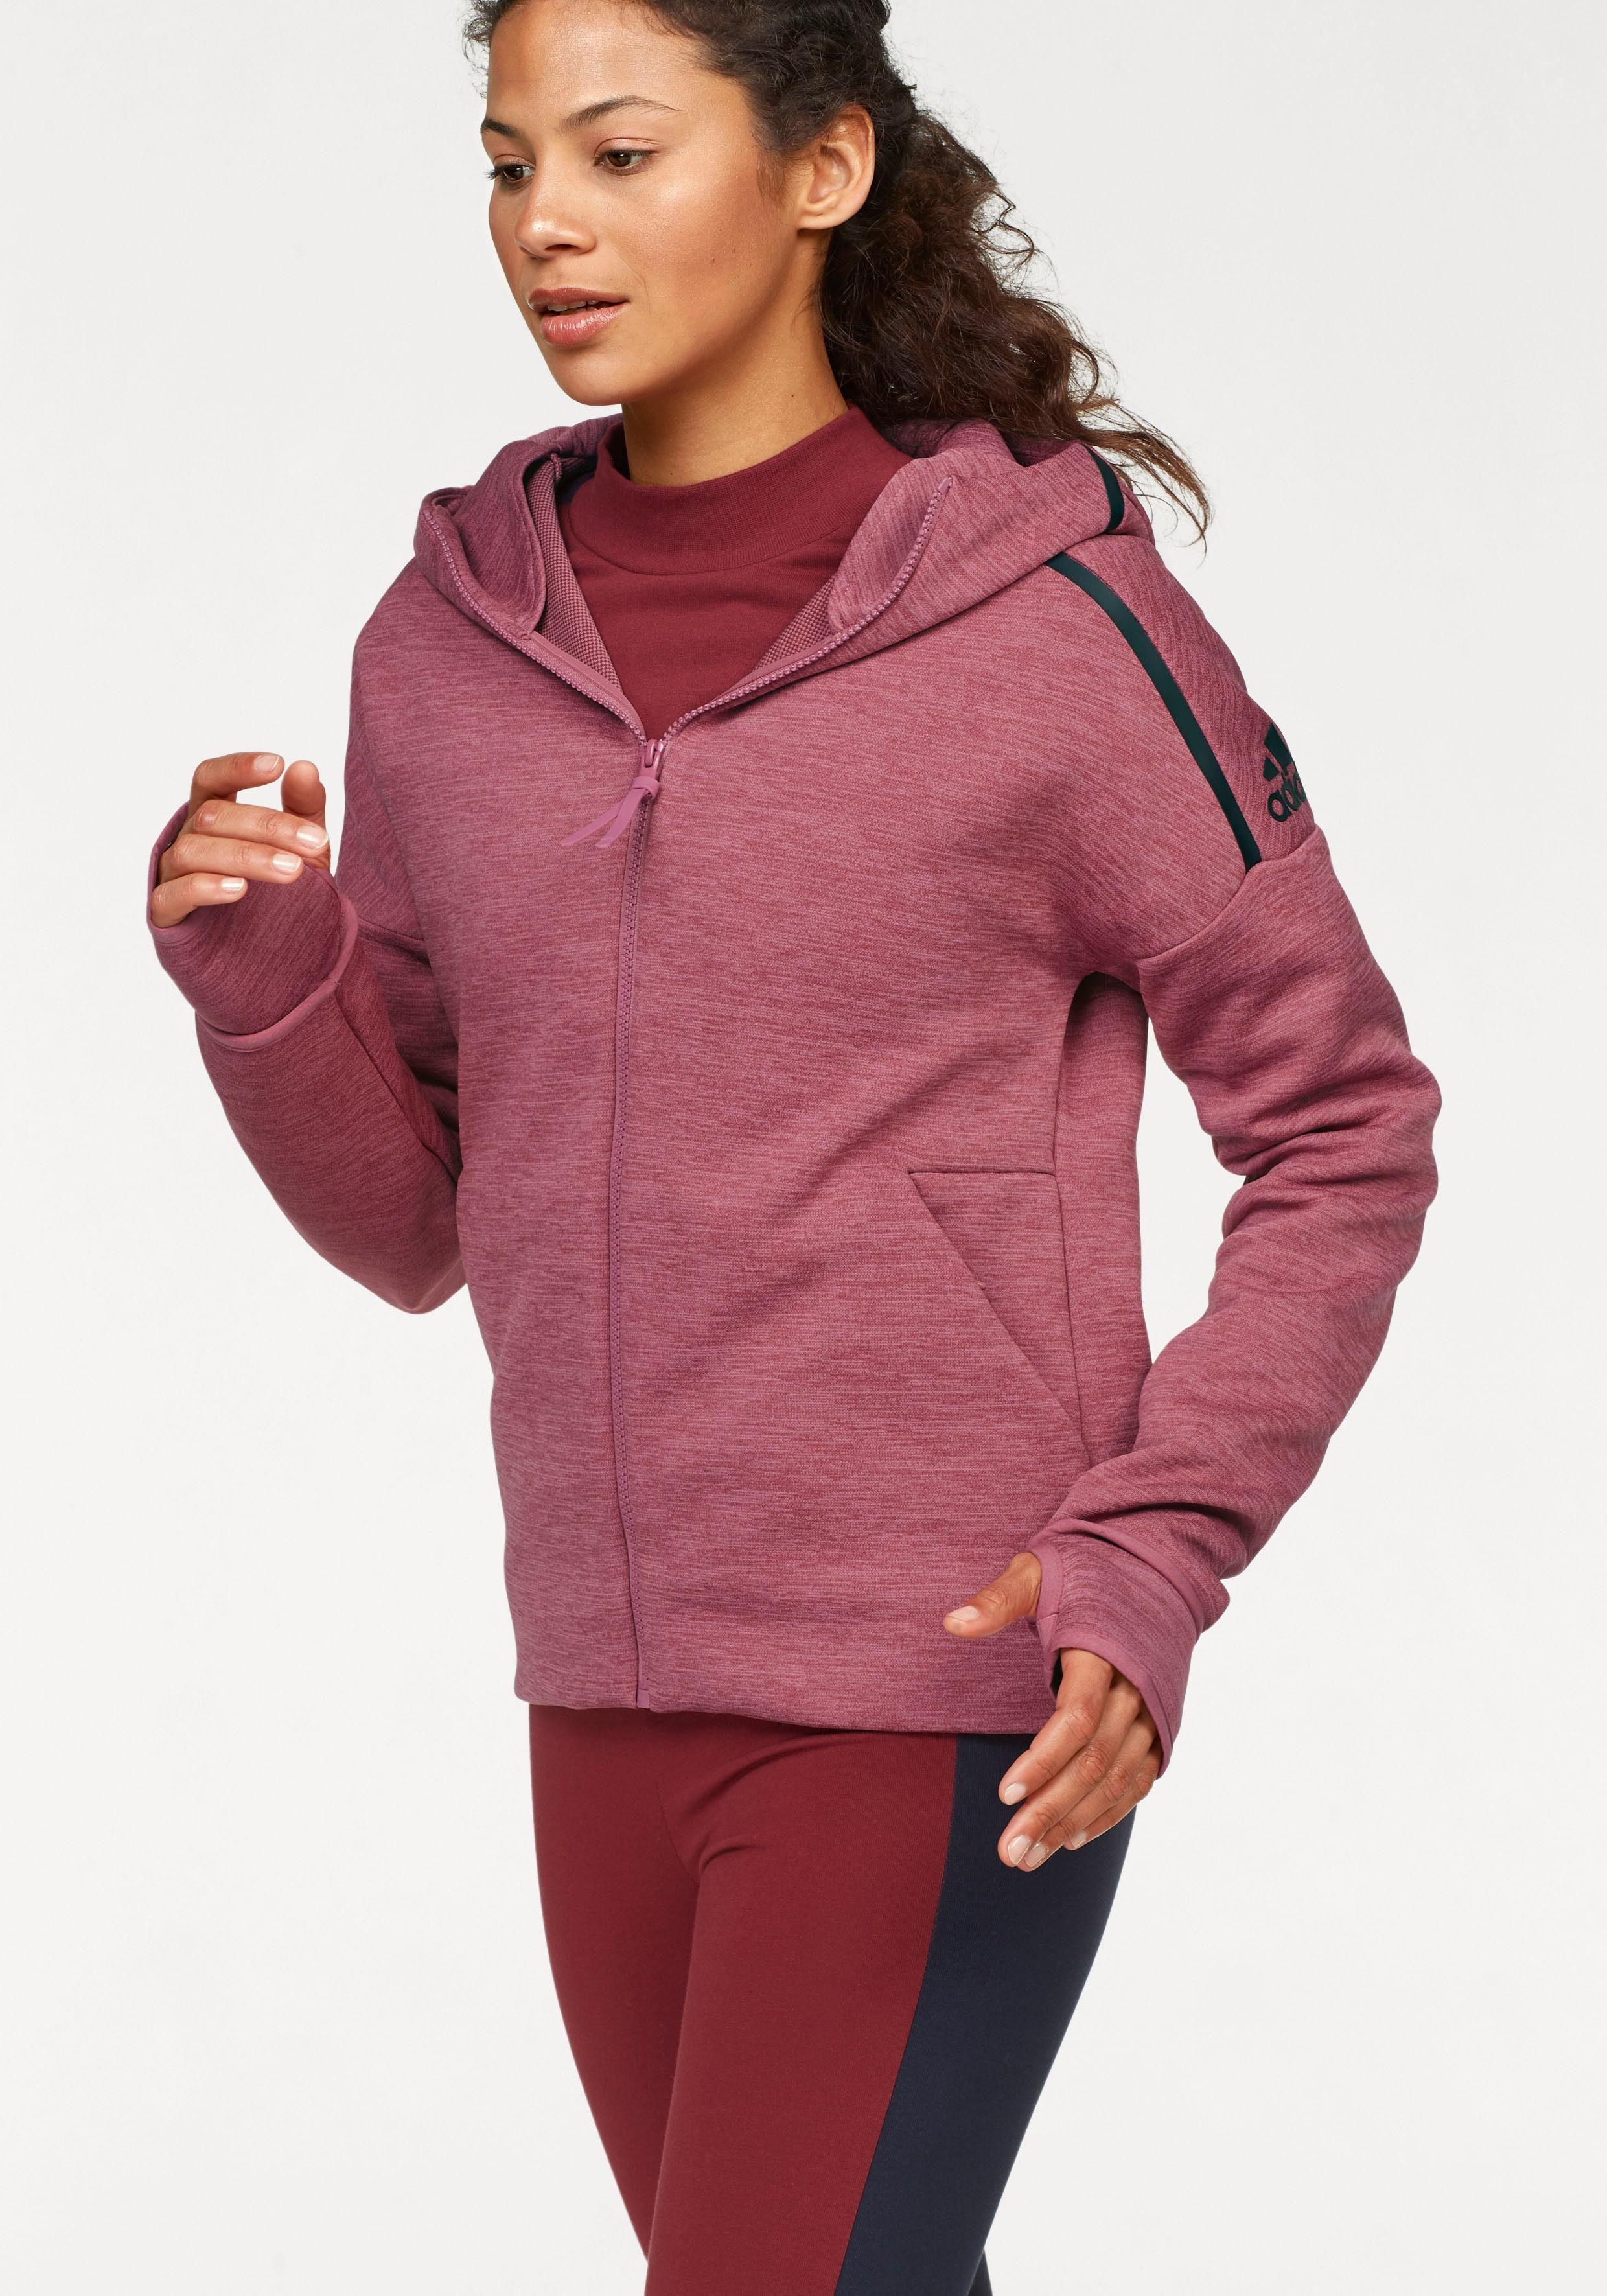 adidas Performance Trainingsjacke »WOMEN Z.N.E. FAST RELEASE HOODIE« auch in großen Größen online kaufen | OTTO